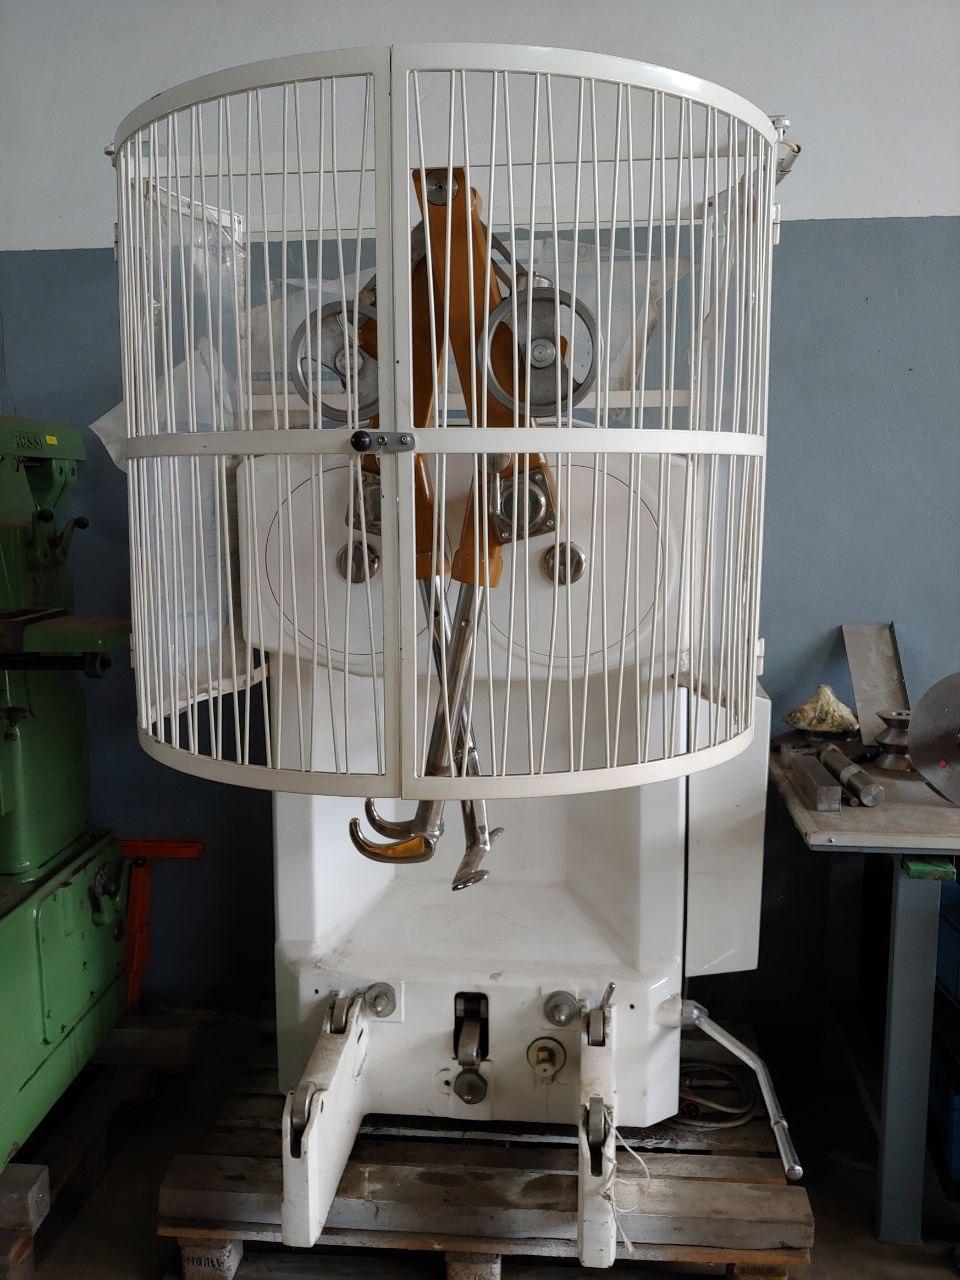 Impastatrice a bracci tuffanti Sottoriva da 120 kg in vendita - foto 3